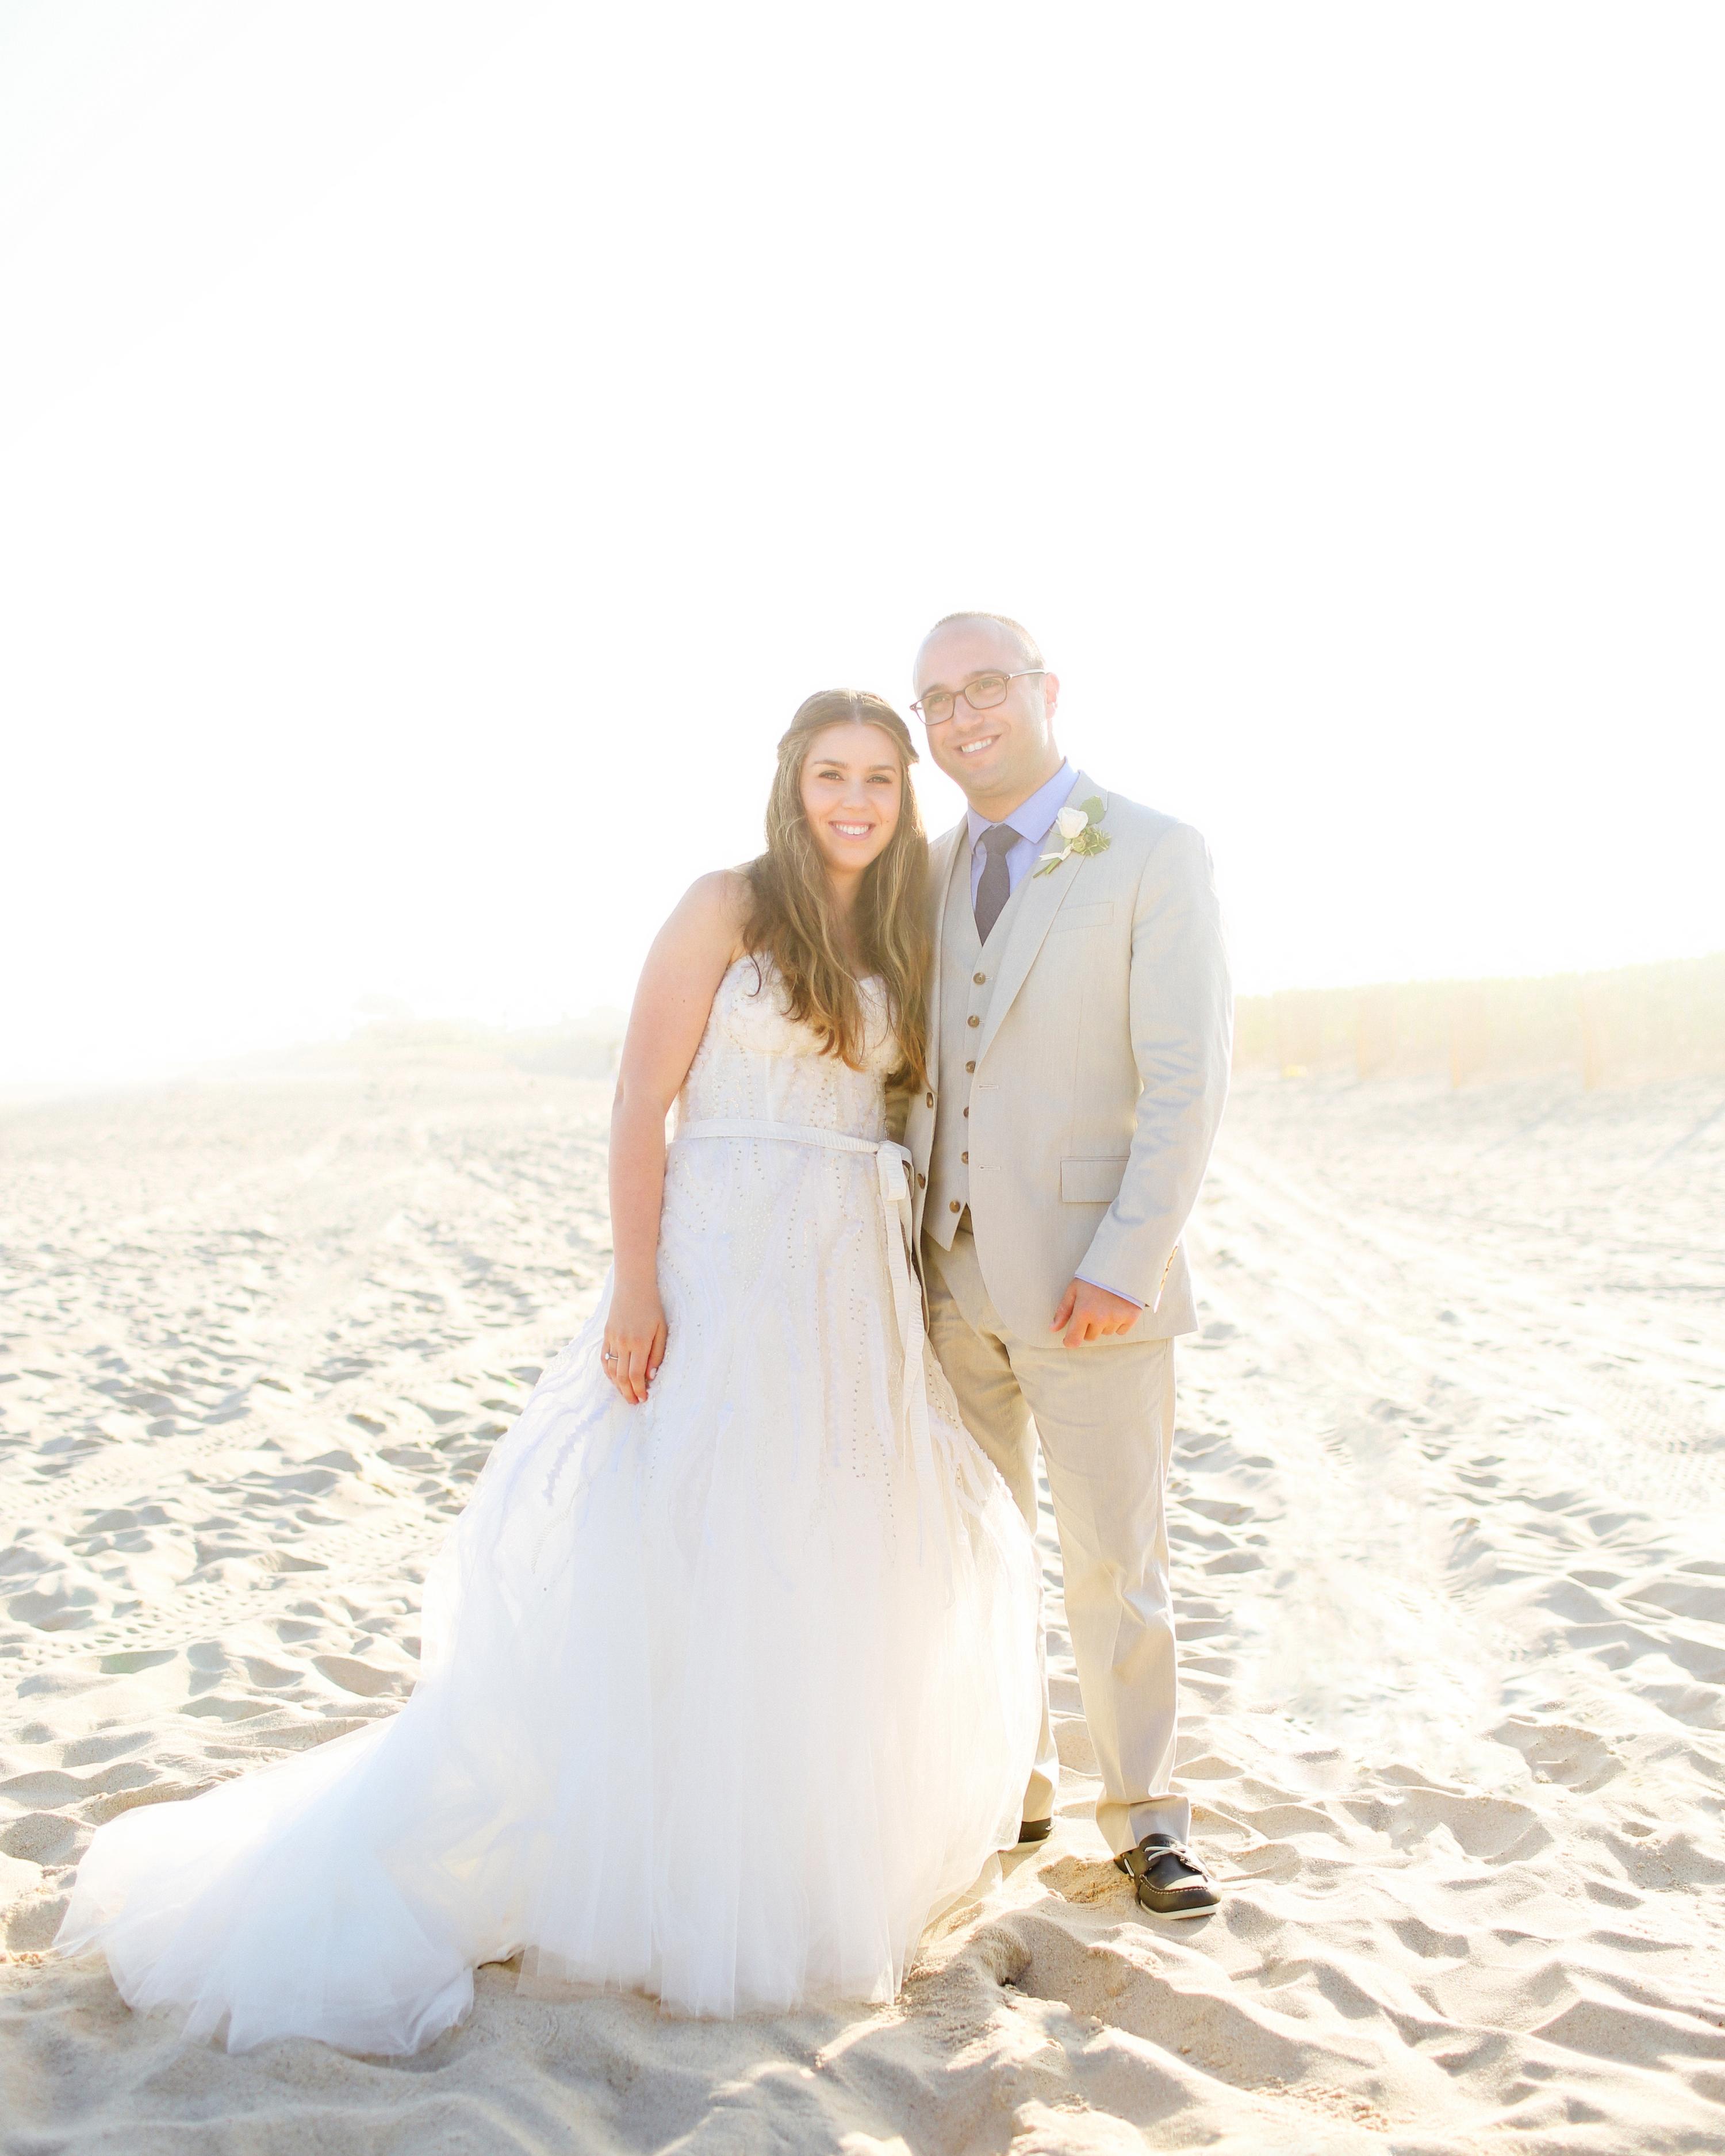 sarah-evan-wedding-portrait3-0514.jpg